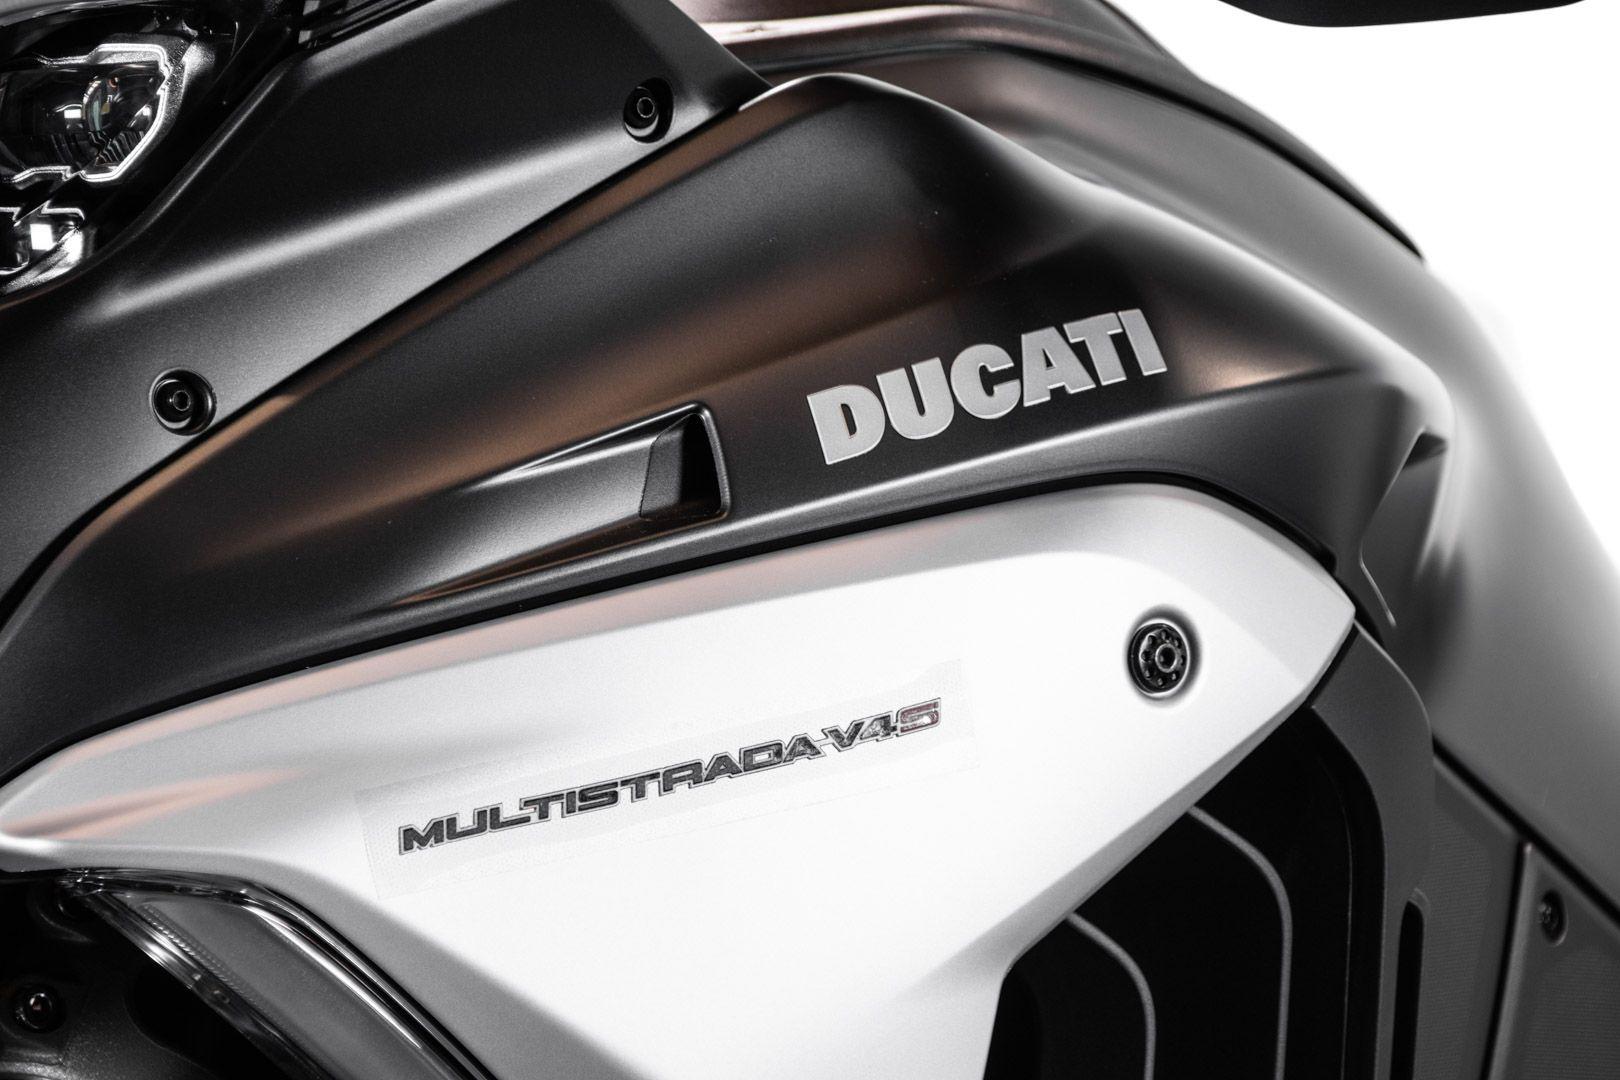 2021 Ducati MULTISTRADA V4 AVIATOR GREY FULL 84054